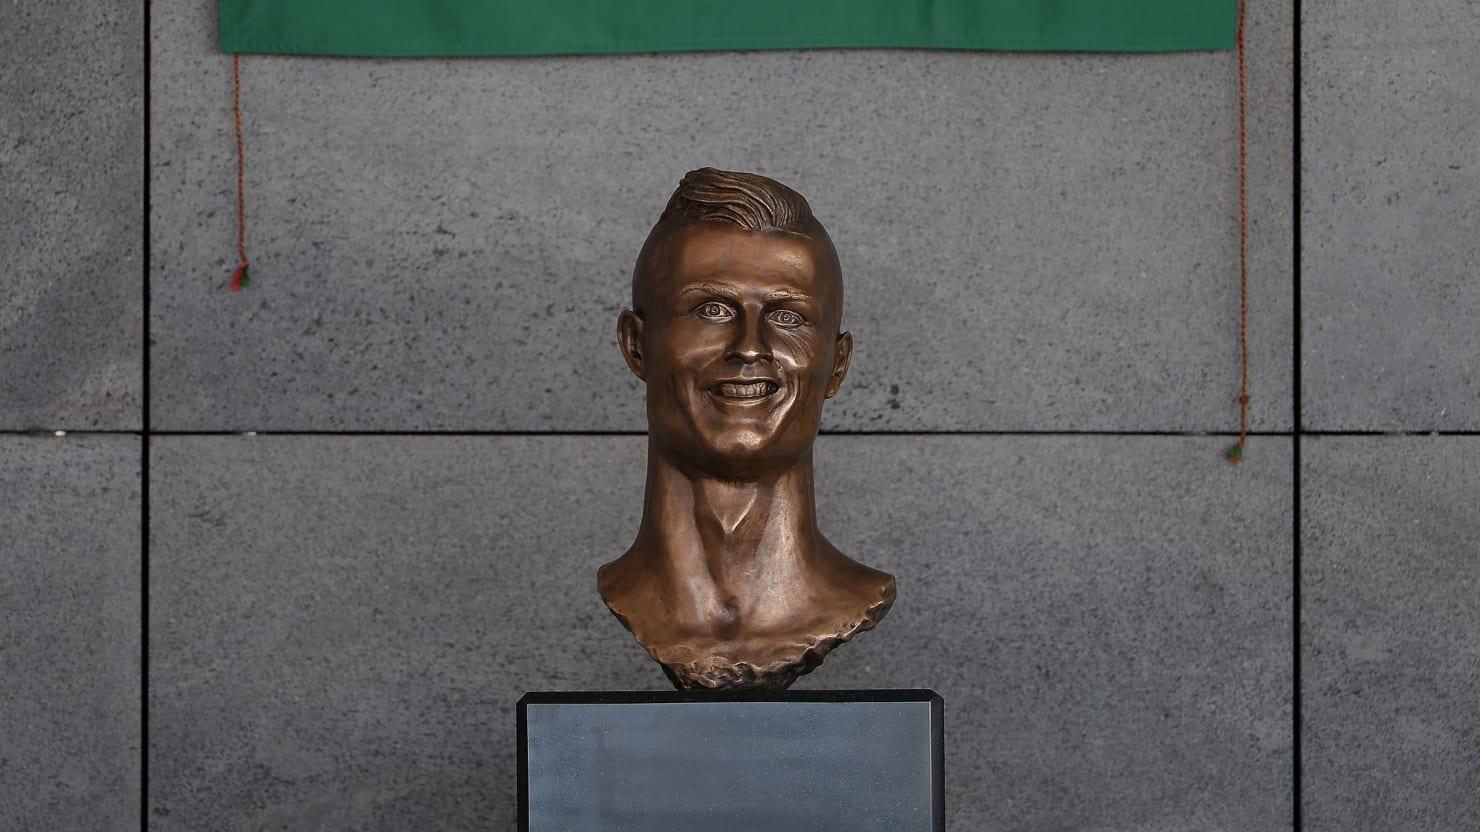 cristiano ronaldo u2019s statue will give you nightmares